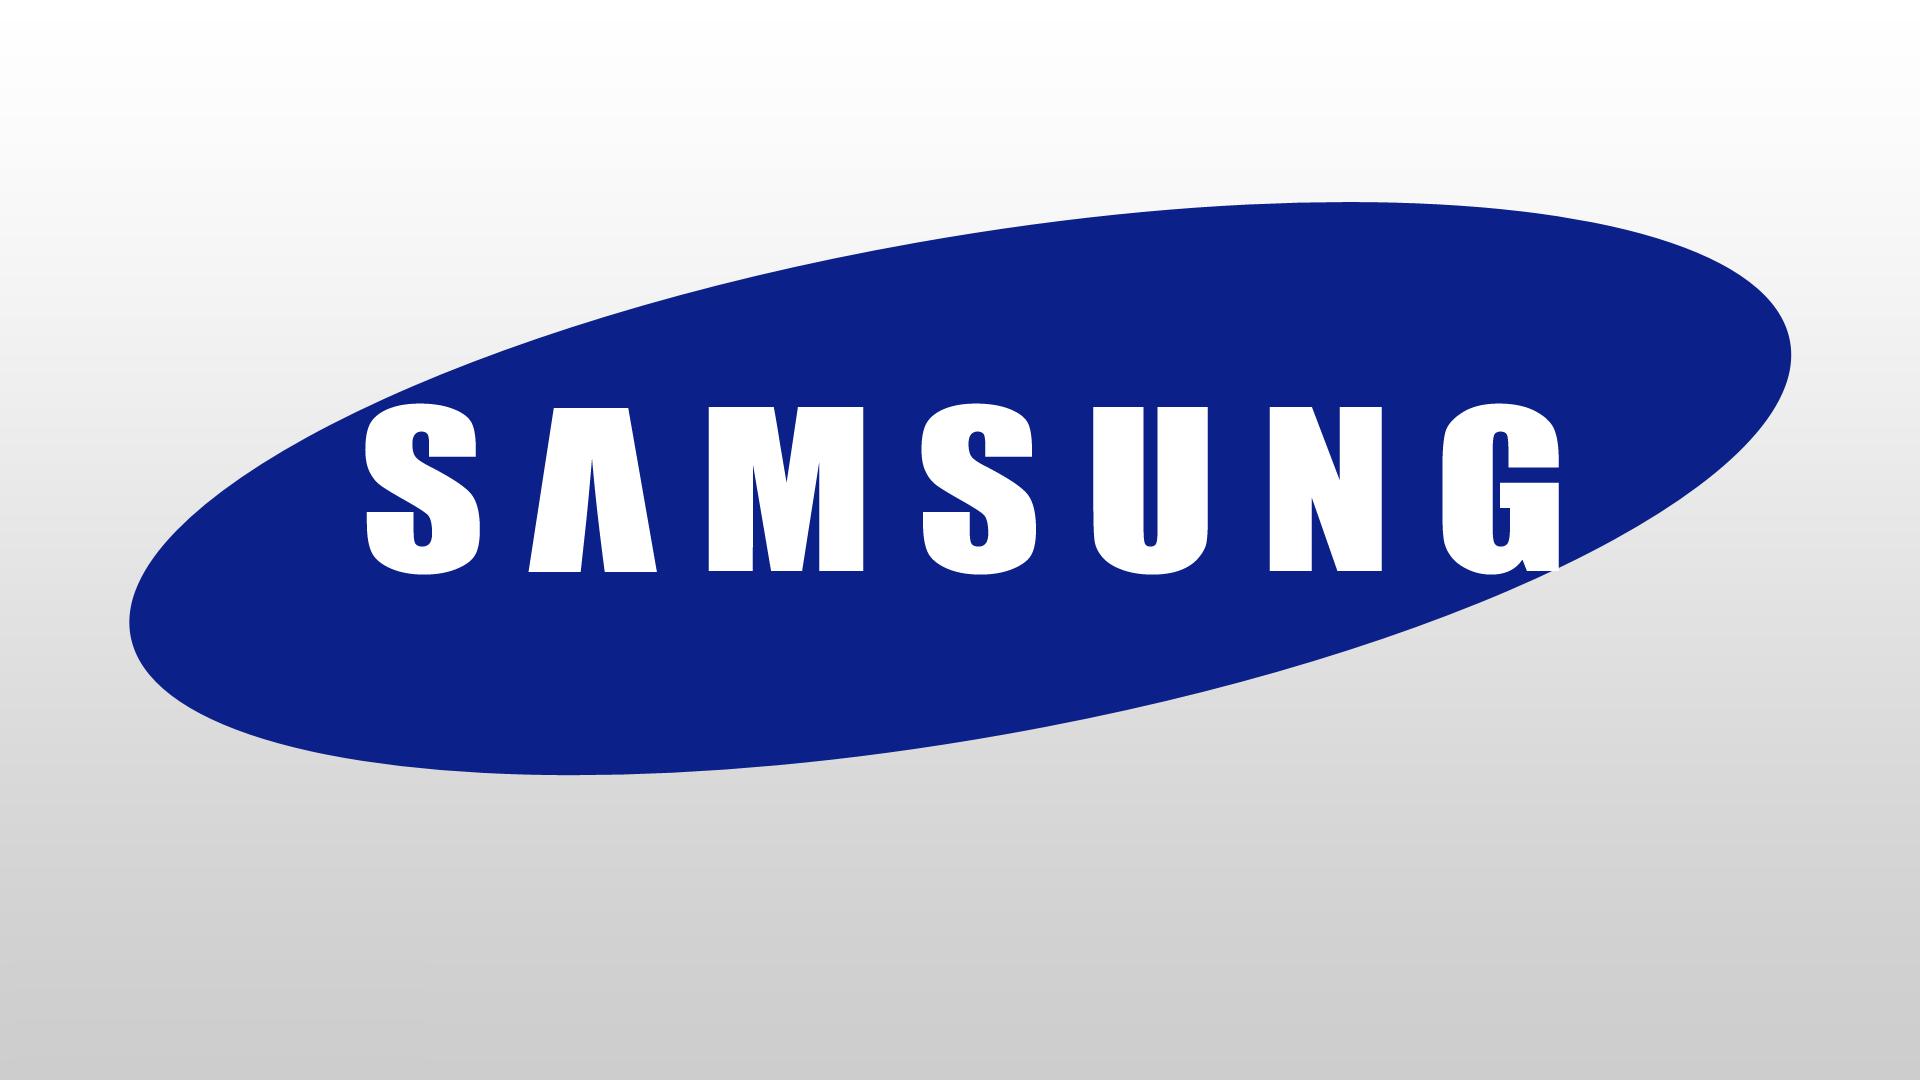 Самсунг начал обновлять прошивку Galaxy A3 до андроид 7.0 Nougat